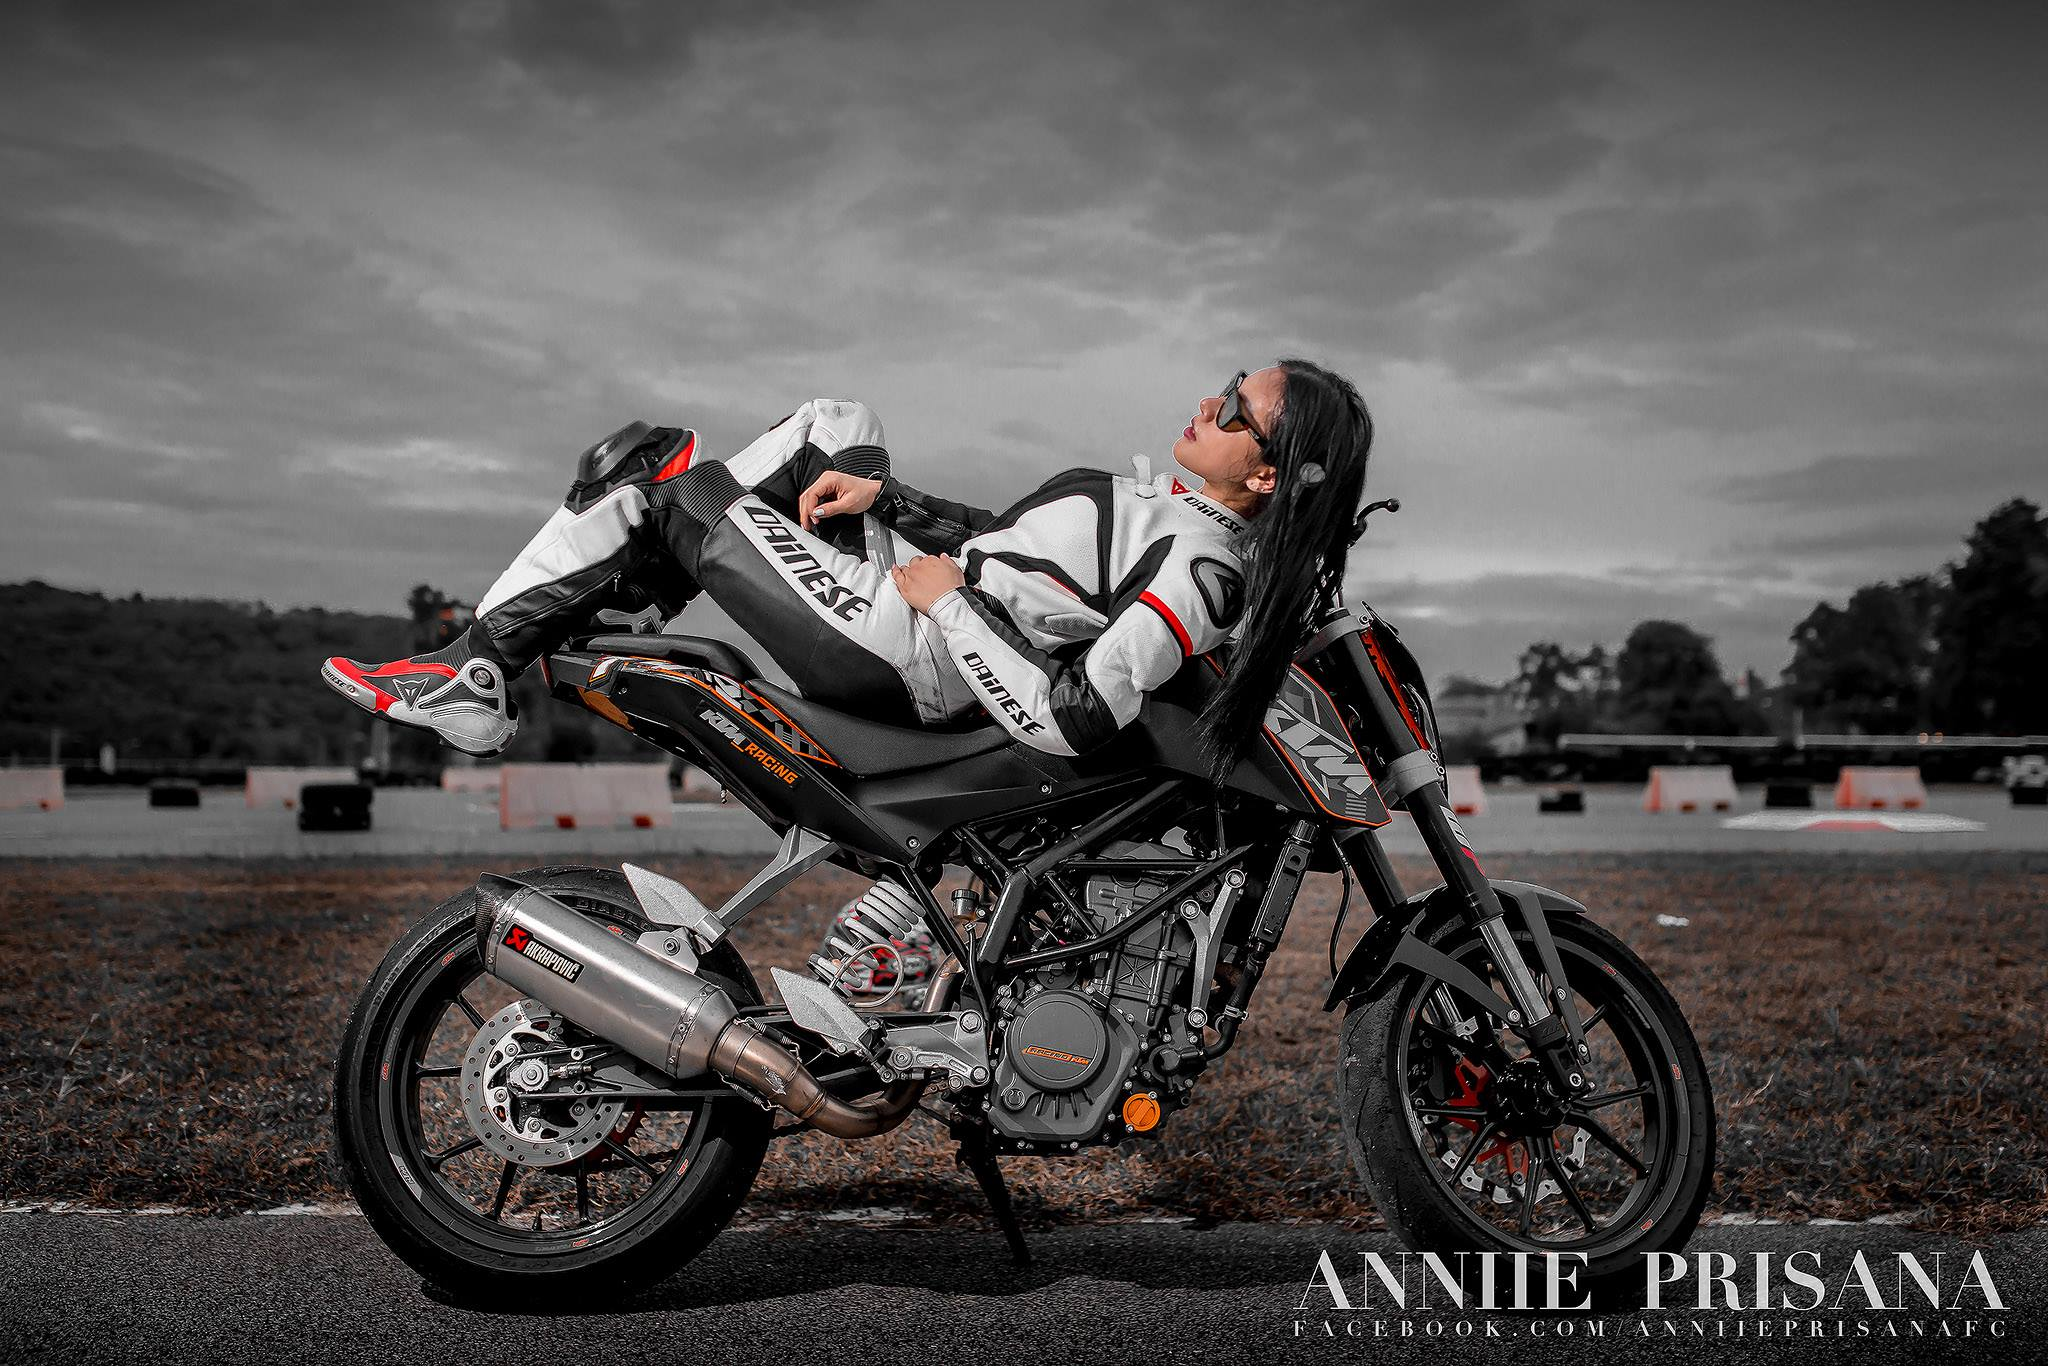 biker chick moto chicks annie returns tracks bike rally anastasiya thailand asphalt chonburi favourite